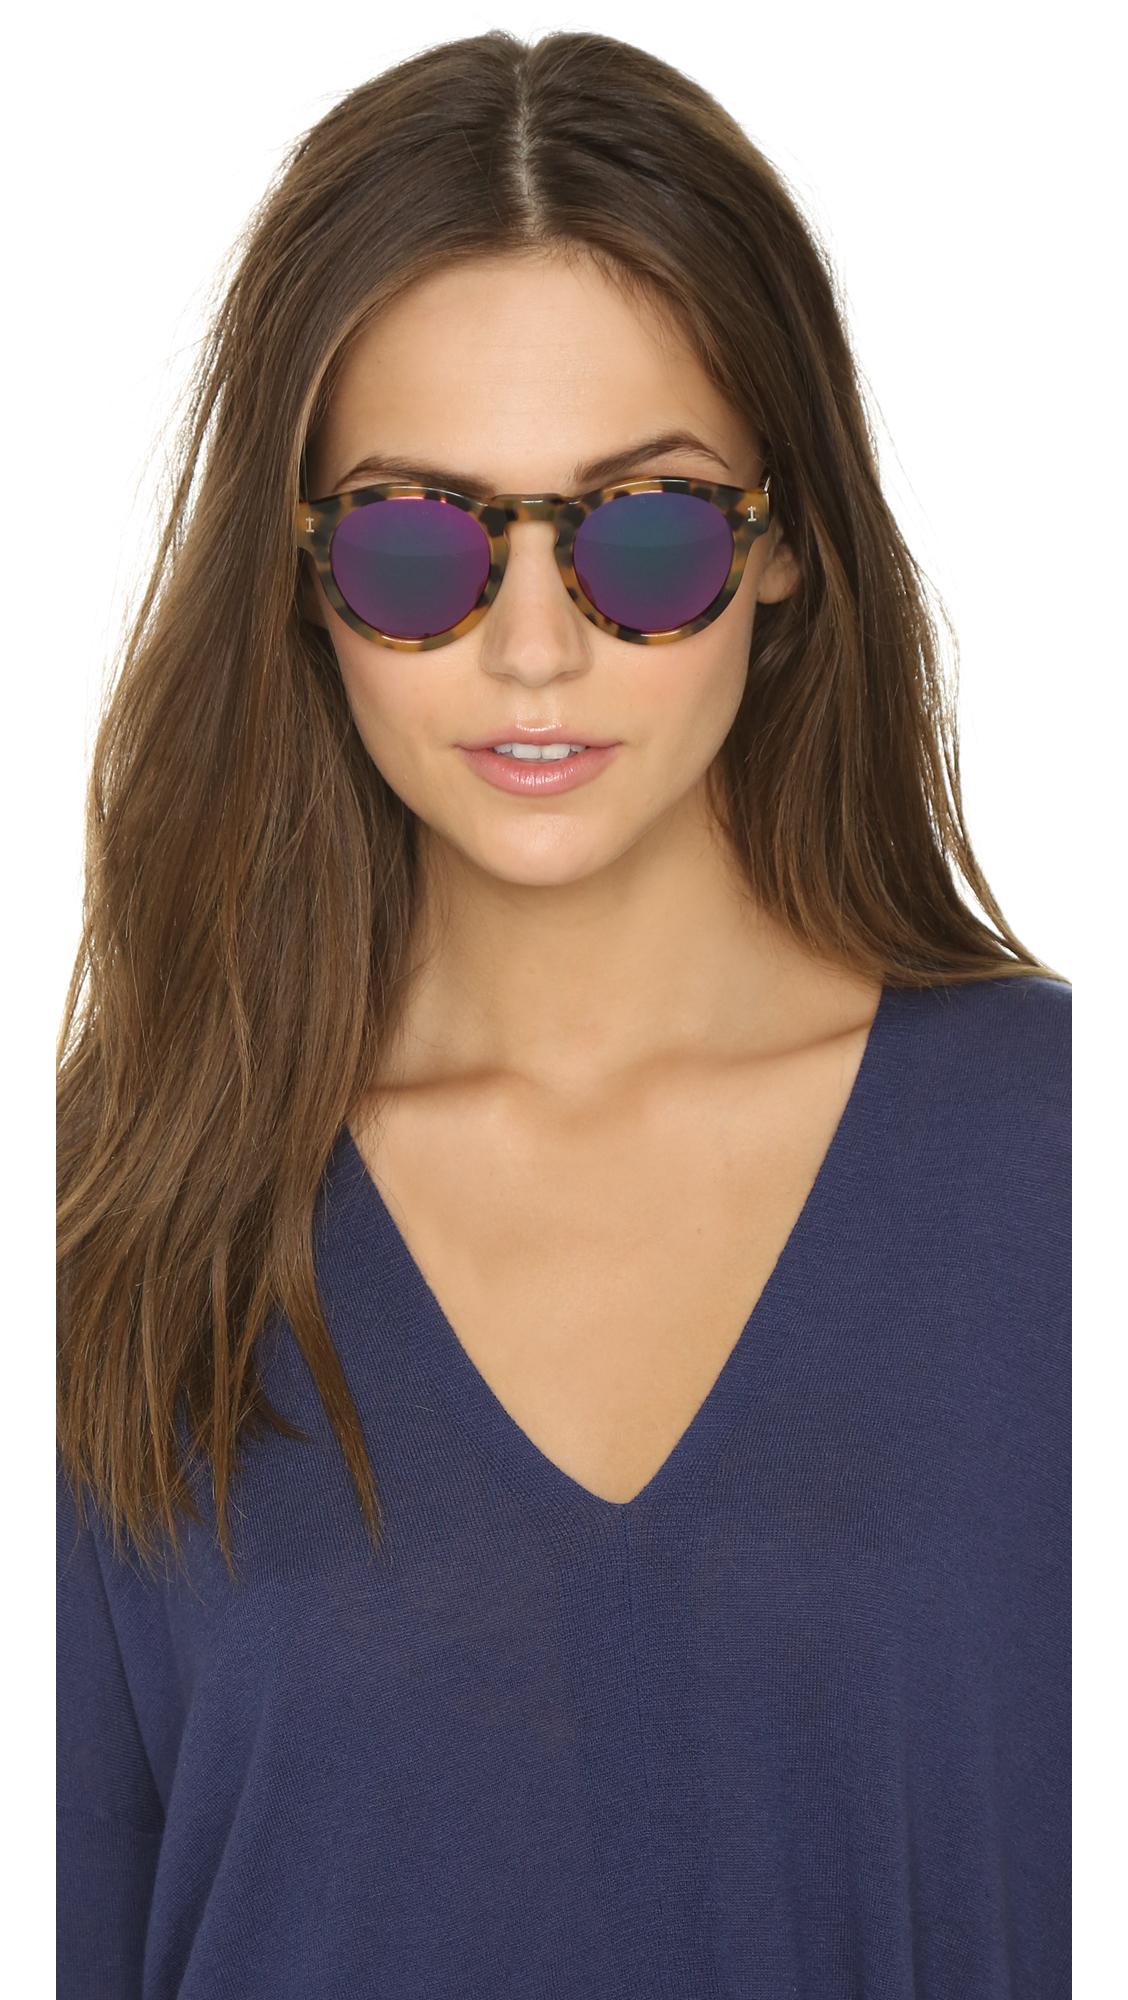 Illesteva Leonard Mirrored Sunglasses In Pink Tortoise